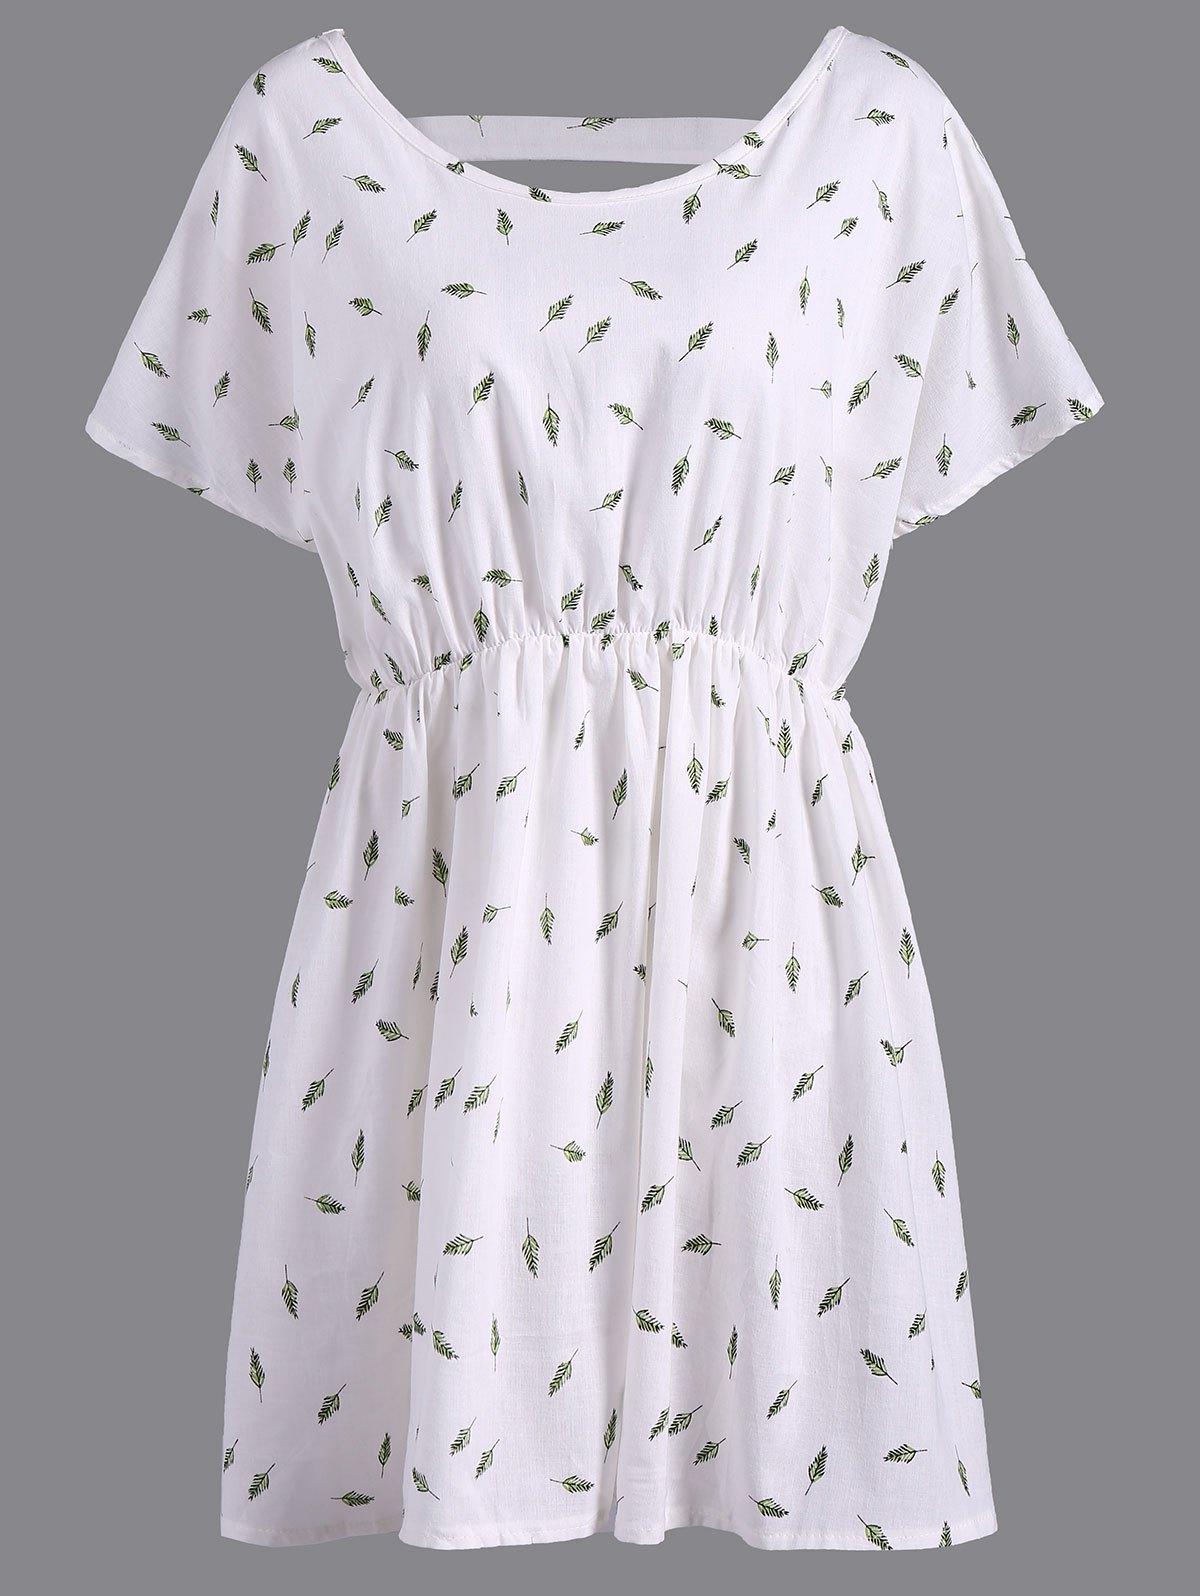 Erfrischende V-Ausschnitt Kurzarm Blatt Print Plus Size Women  's Bluse